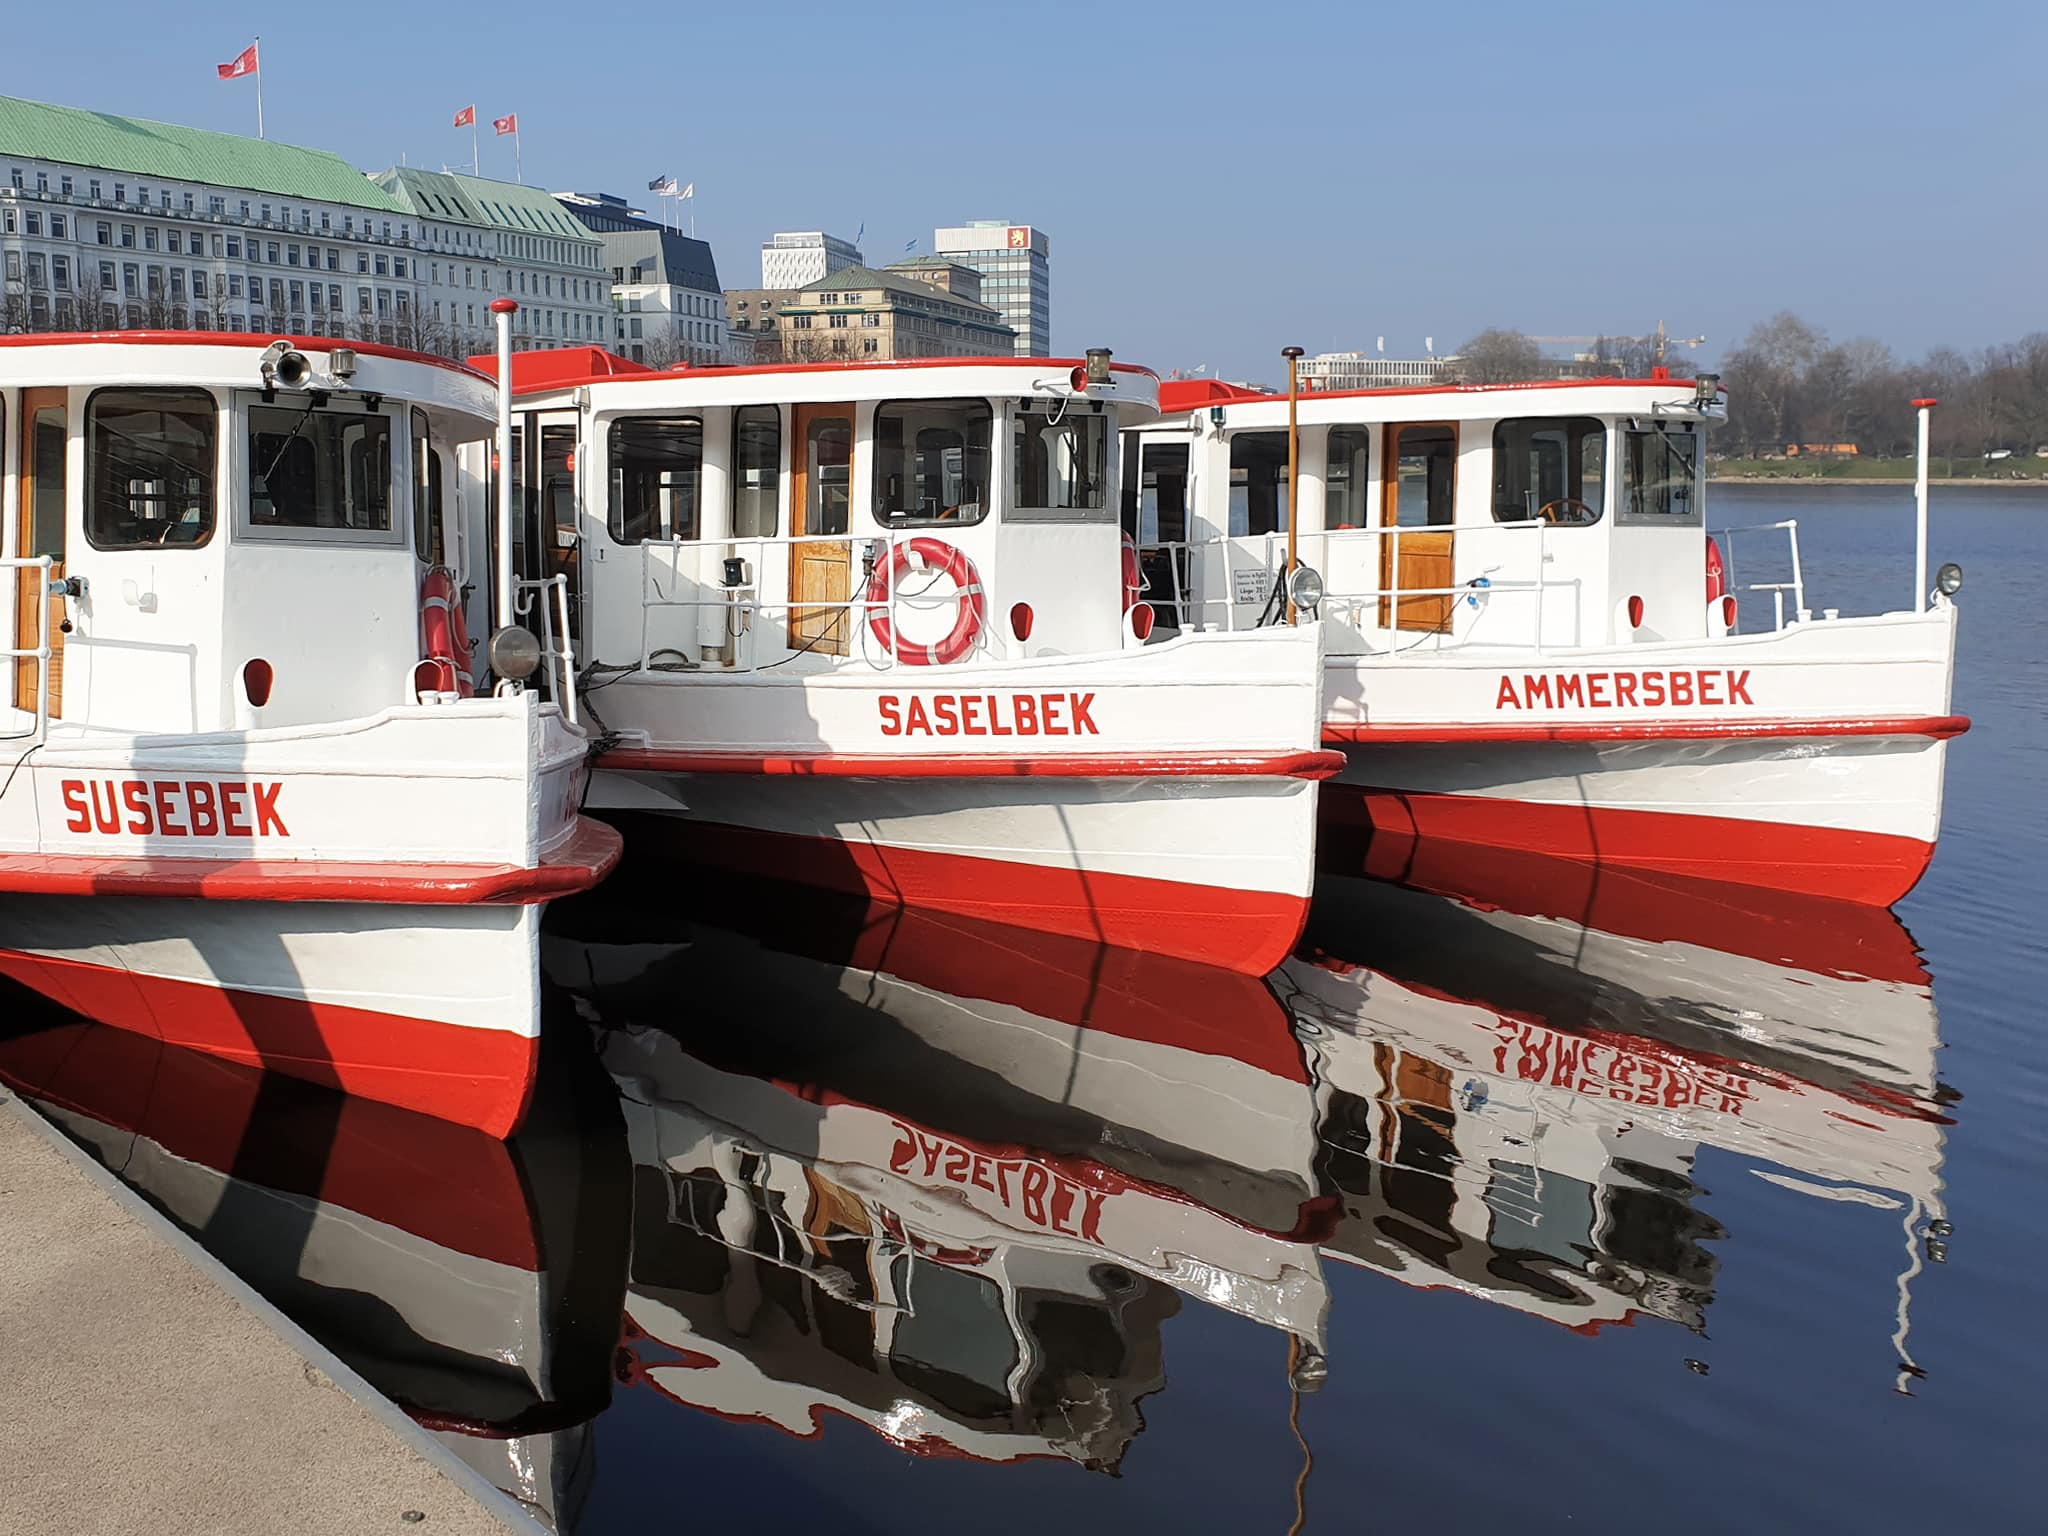 An der Binnenalster in Hamburg (Jungfernstieg) - Foto: FOLLOW ME Hamburg